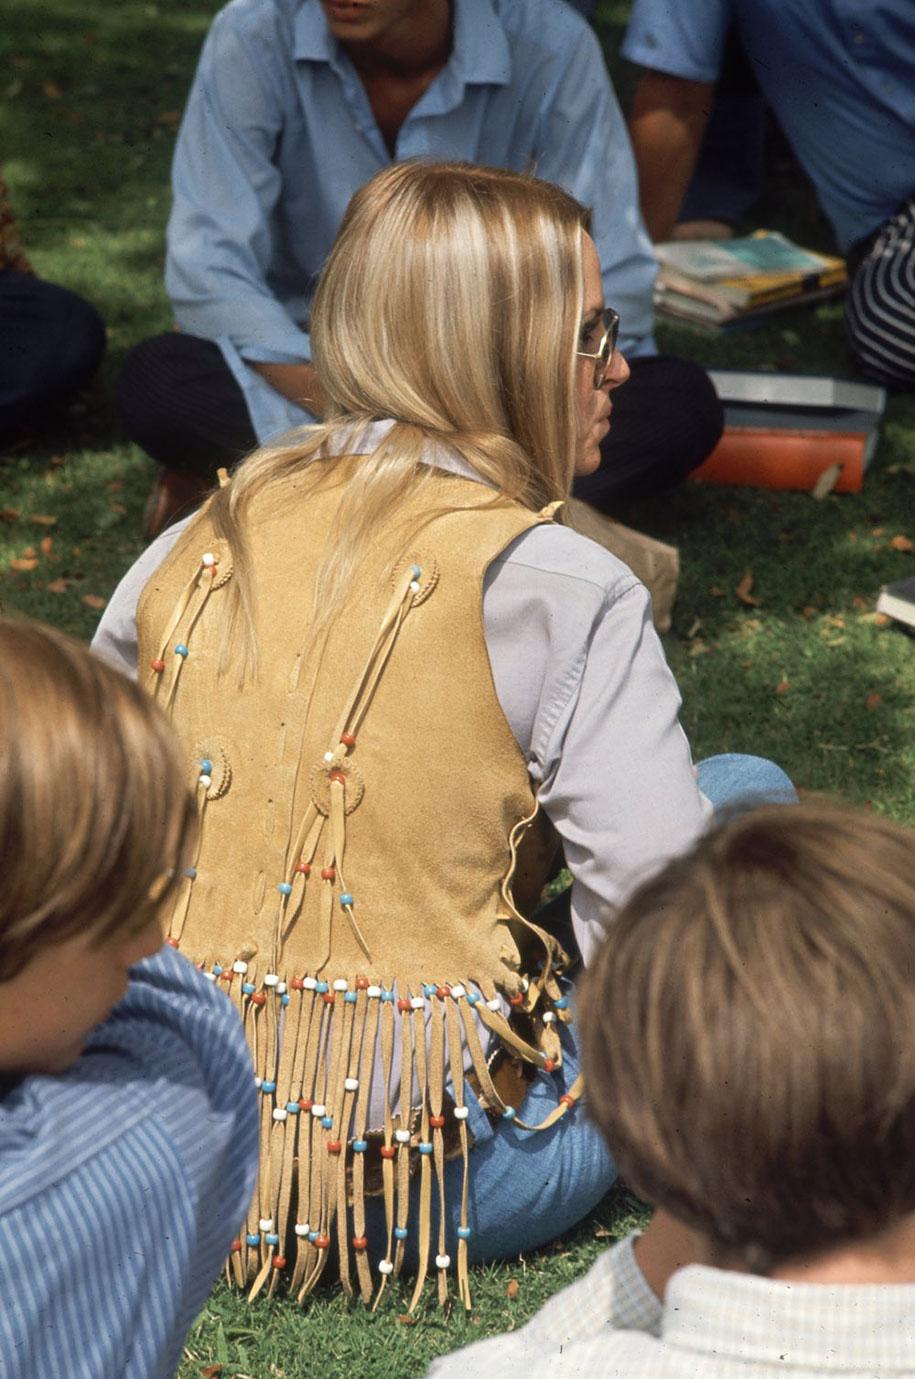 1969-hippie-high-school-counterculture-photography-13